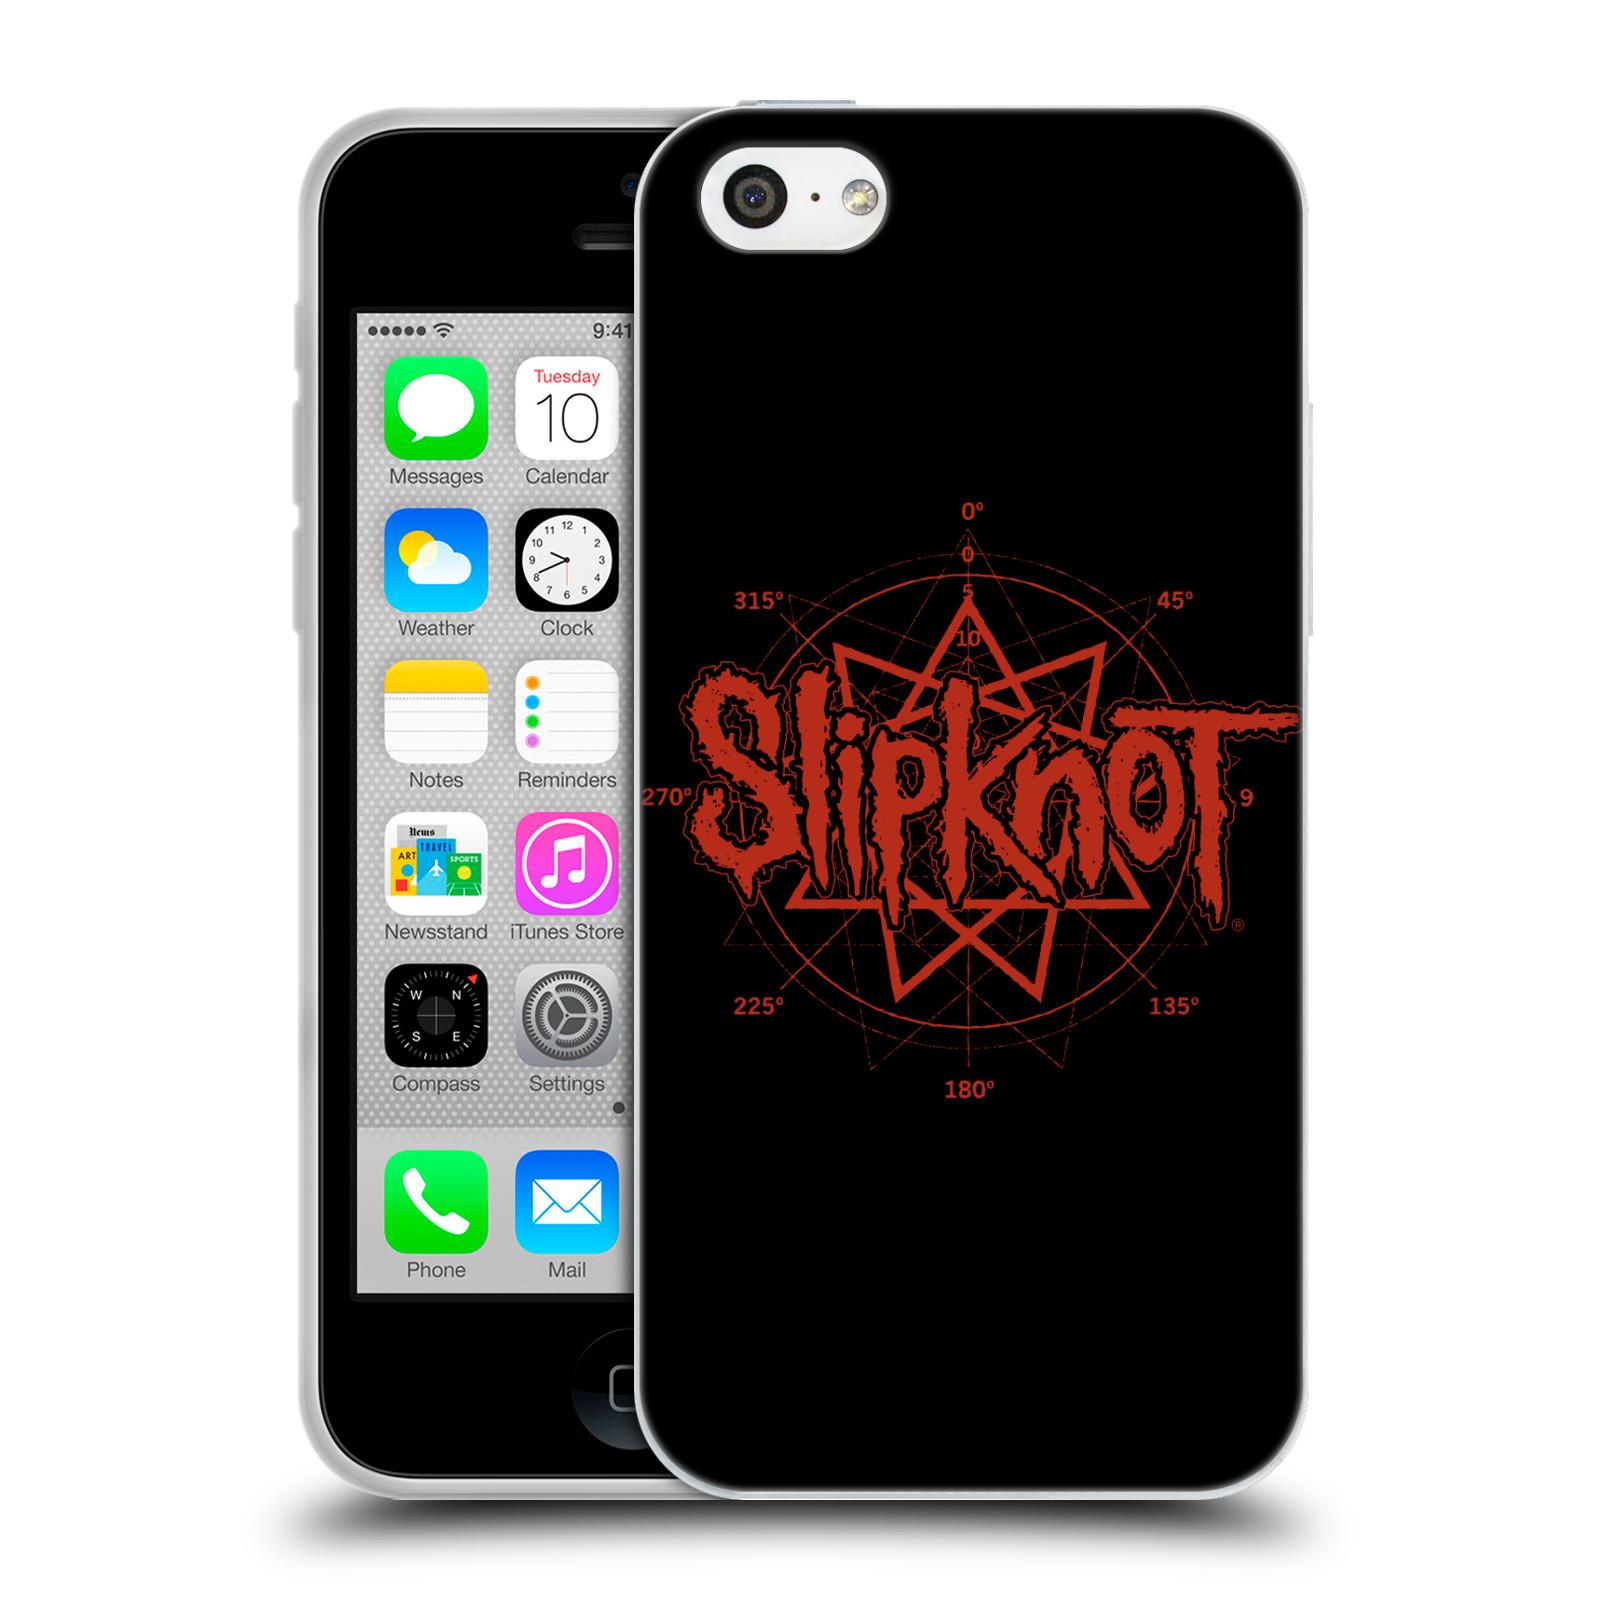 HEAD CASE silikonový obal na mobil Apple Iphone 5C hudební skupina Slipknot logo